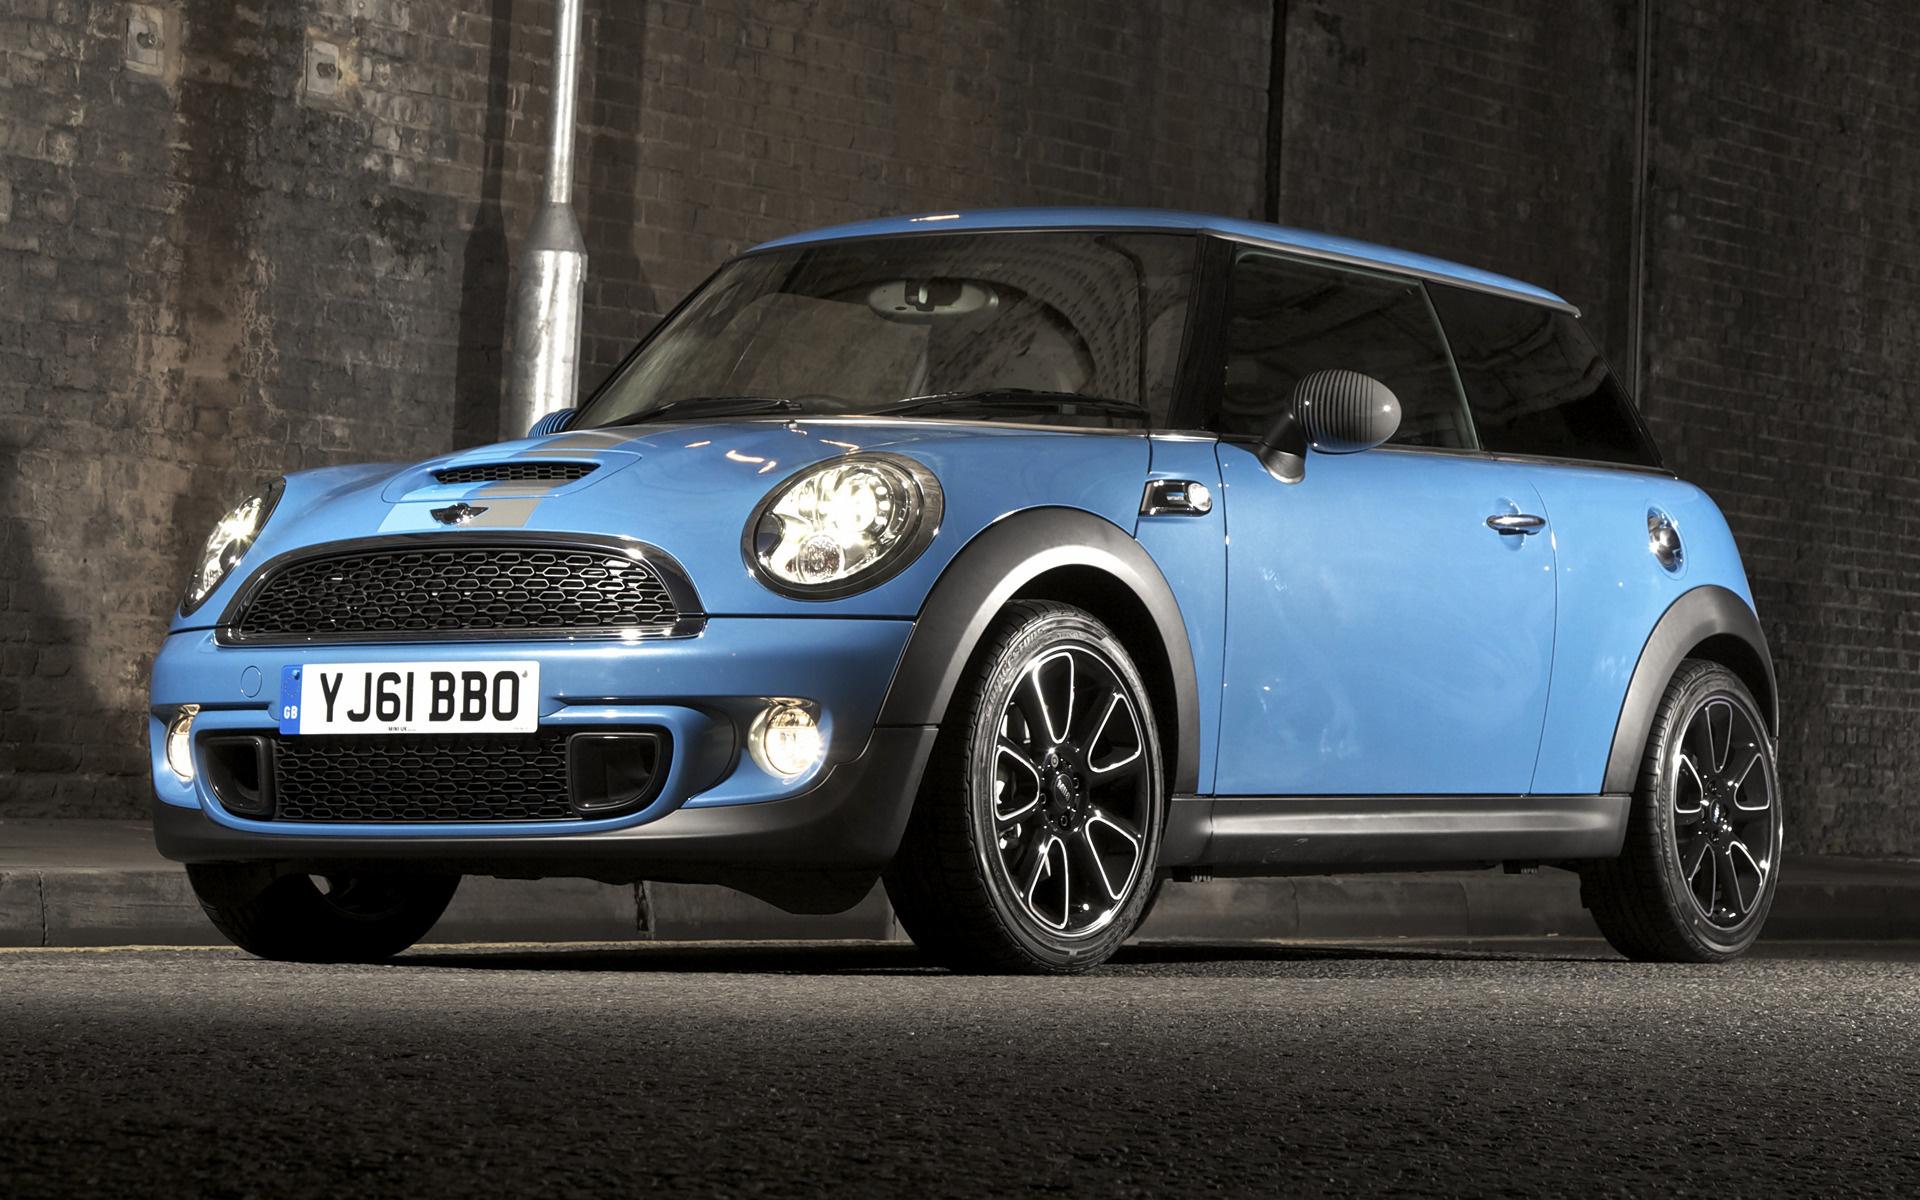 Bmw Mini Cooper >> 2012 Mini Cooper S Bayswater (UK) - Wallpapers and HD